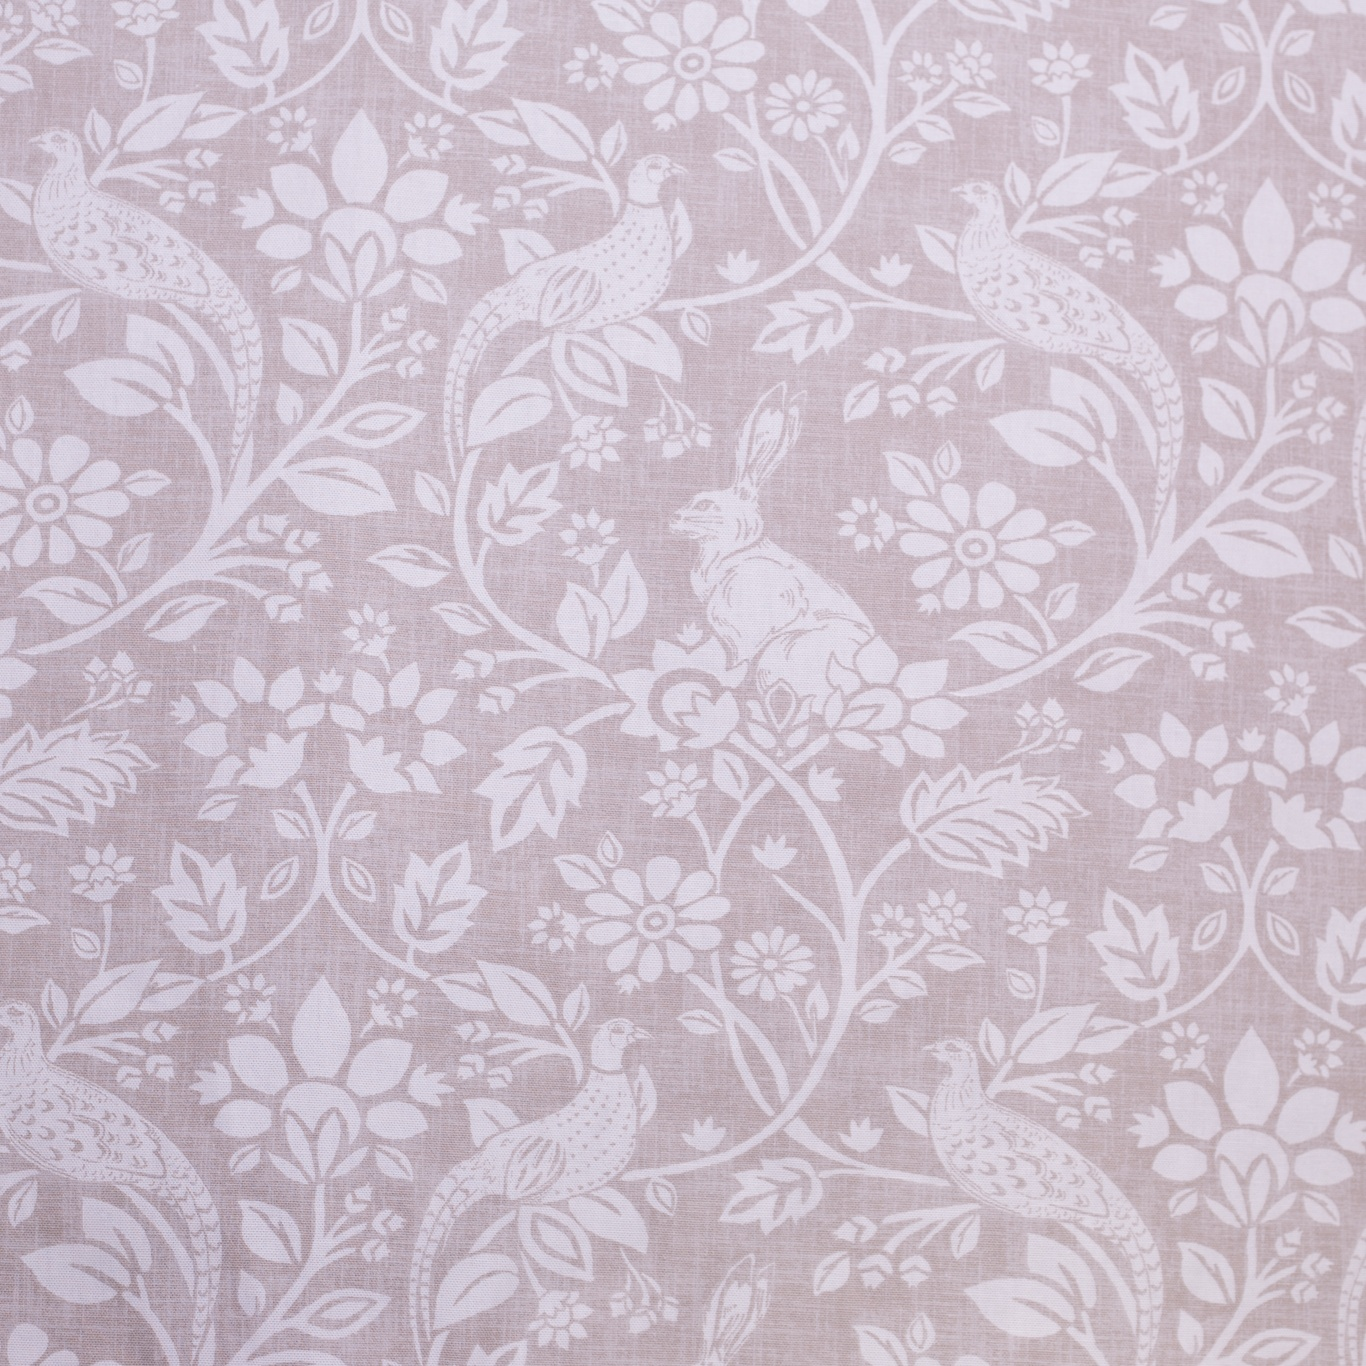 Image of Swatch Box Heathland Linen Curtain Fabric